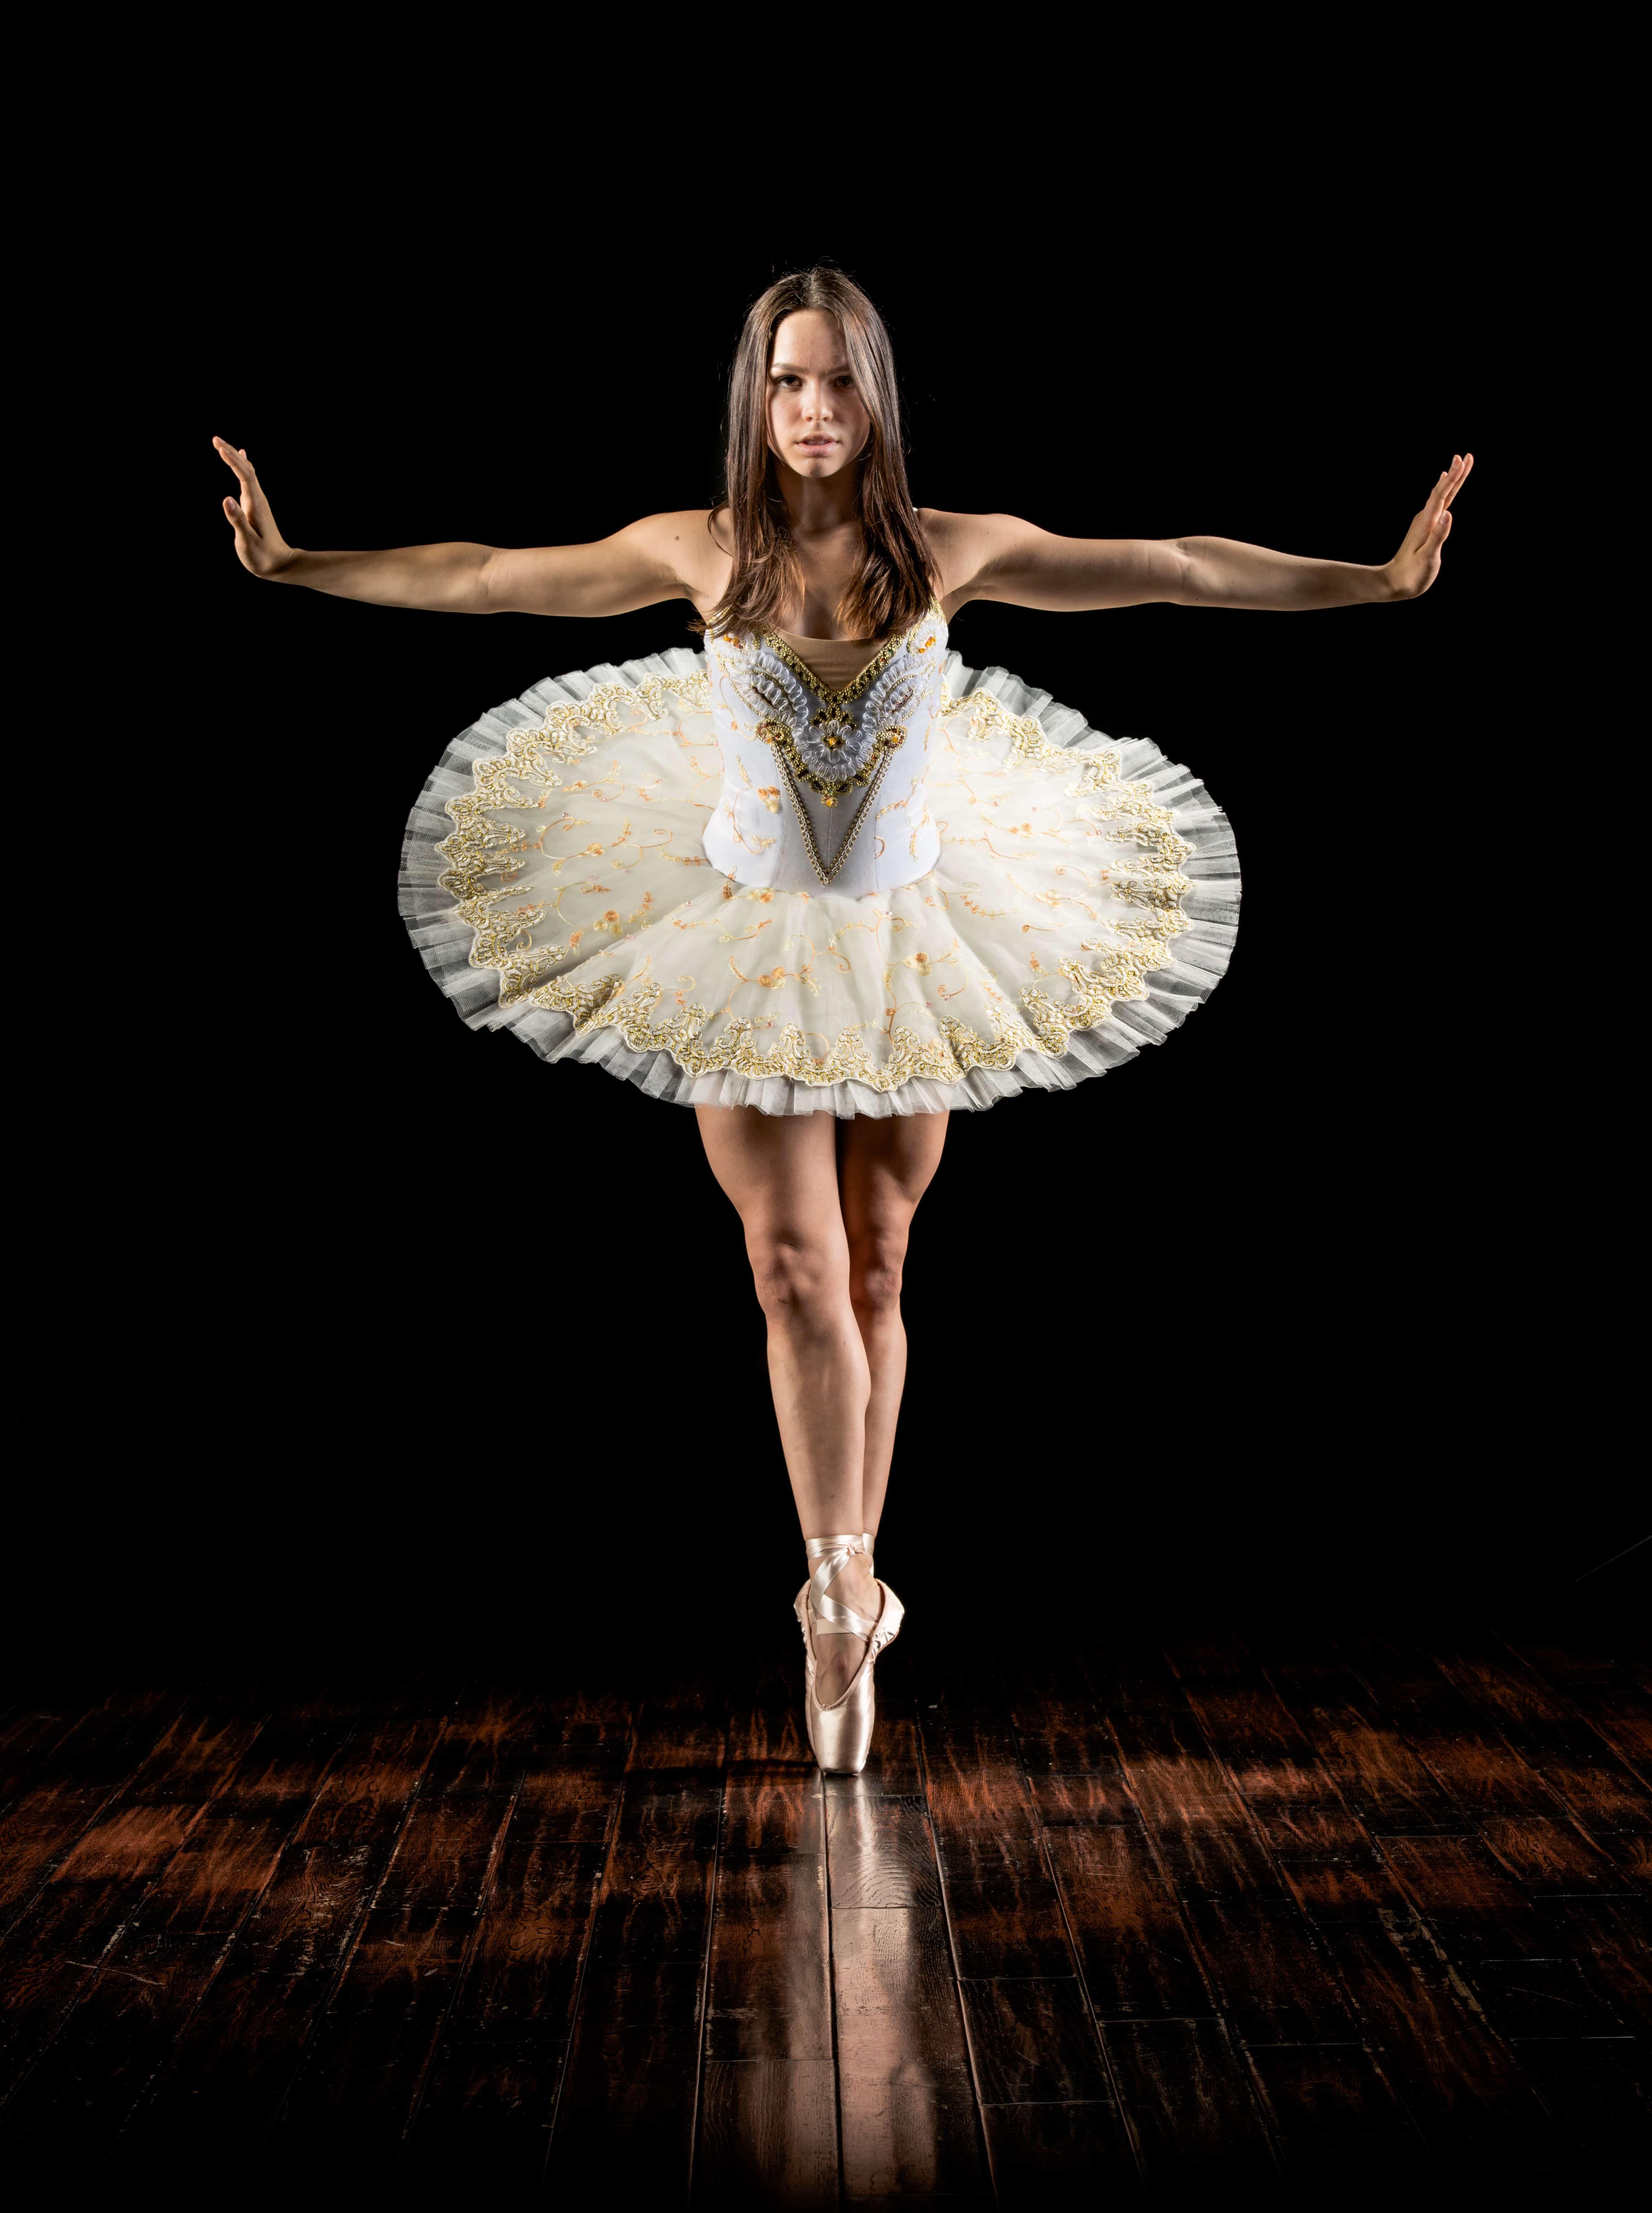 Woman dancing in dance studio